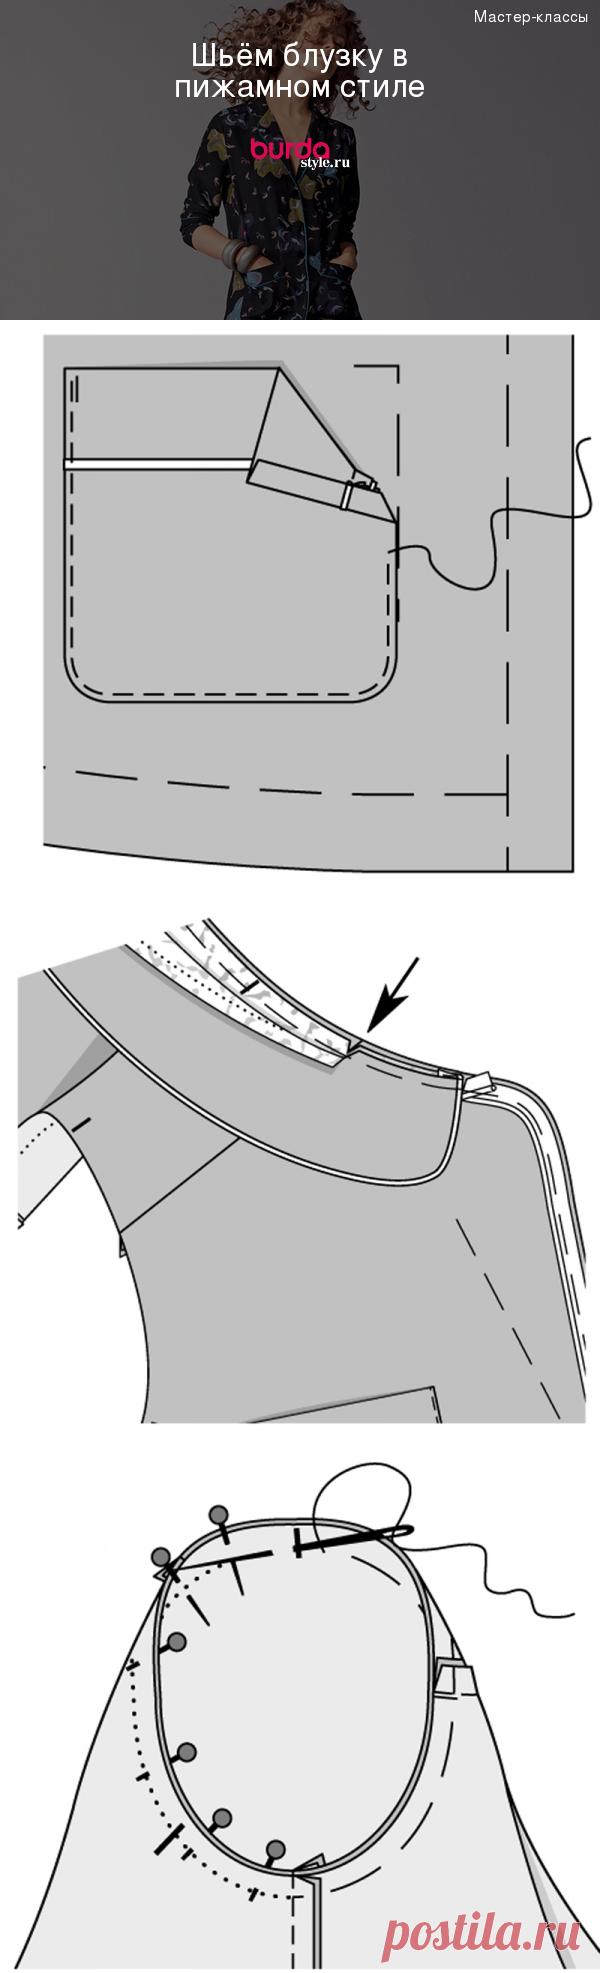 Как сшить блузку мастер класс